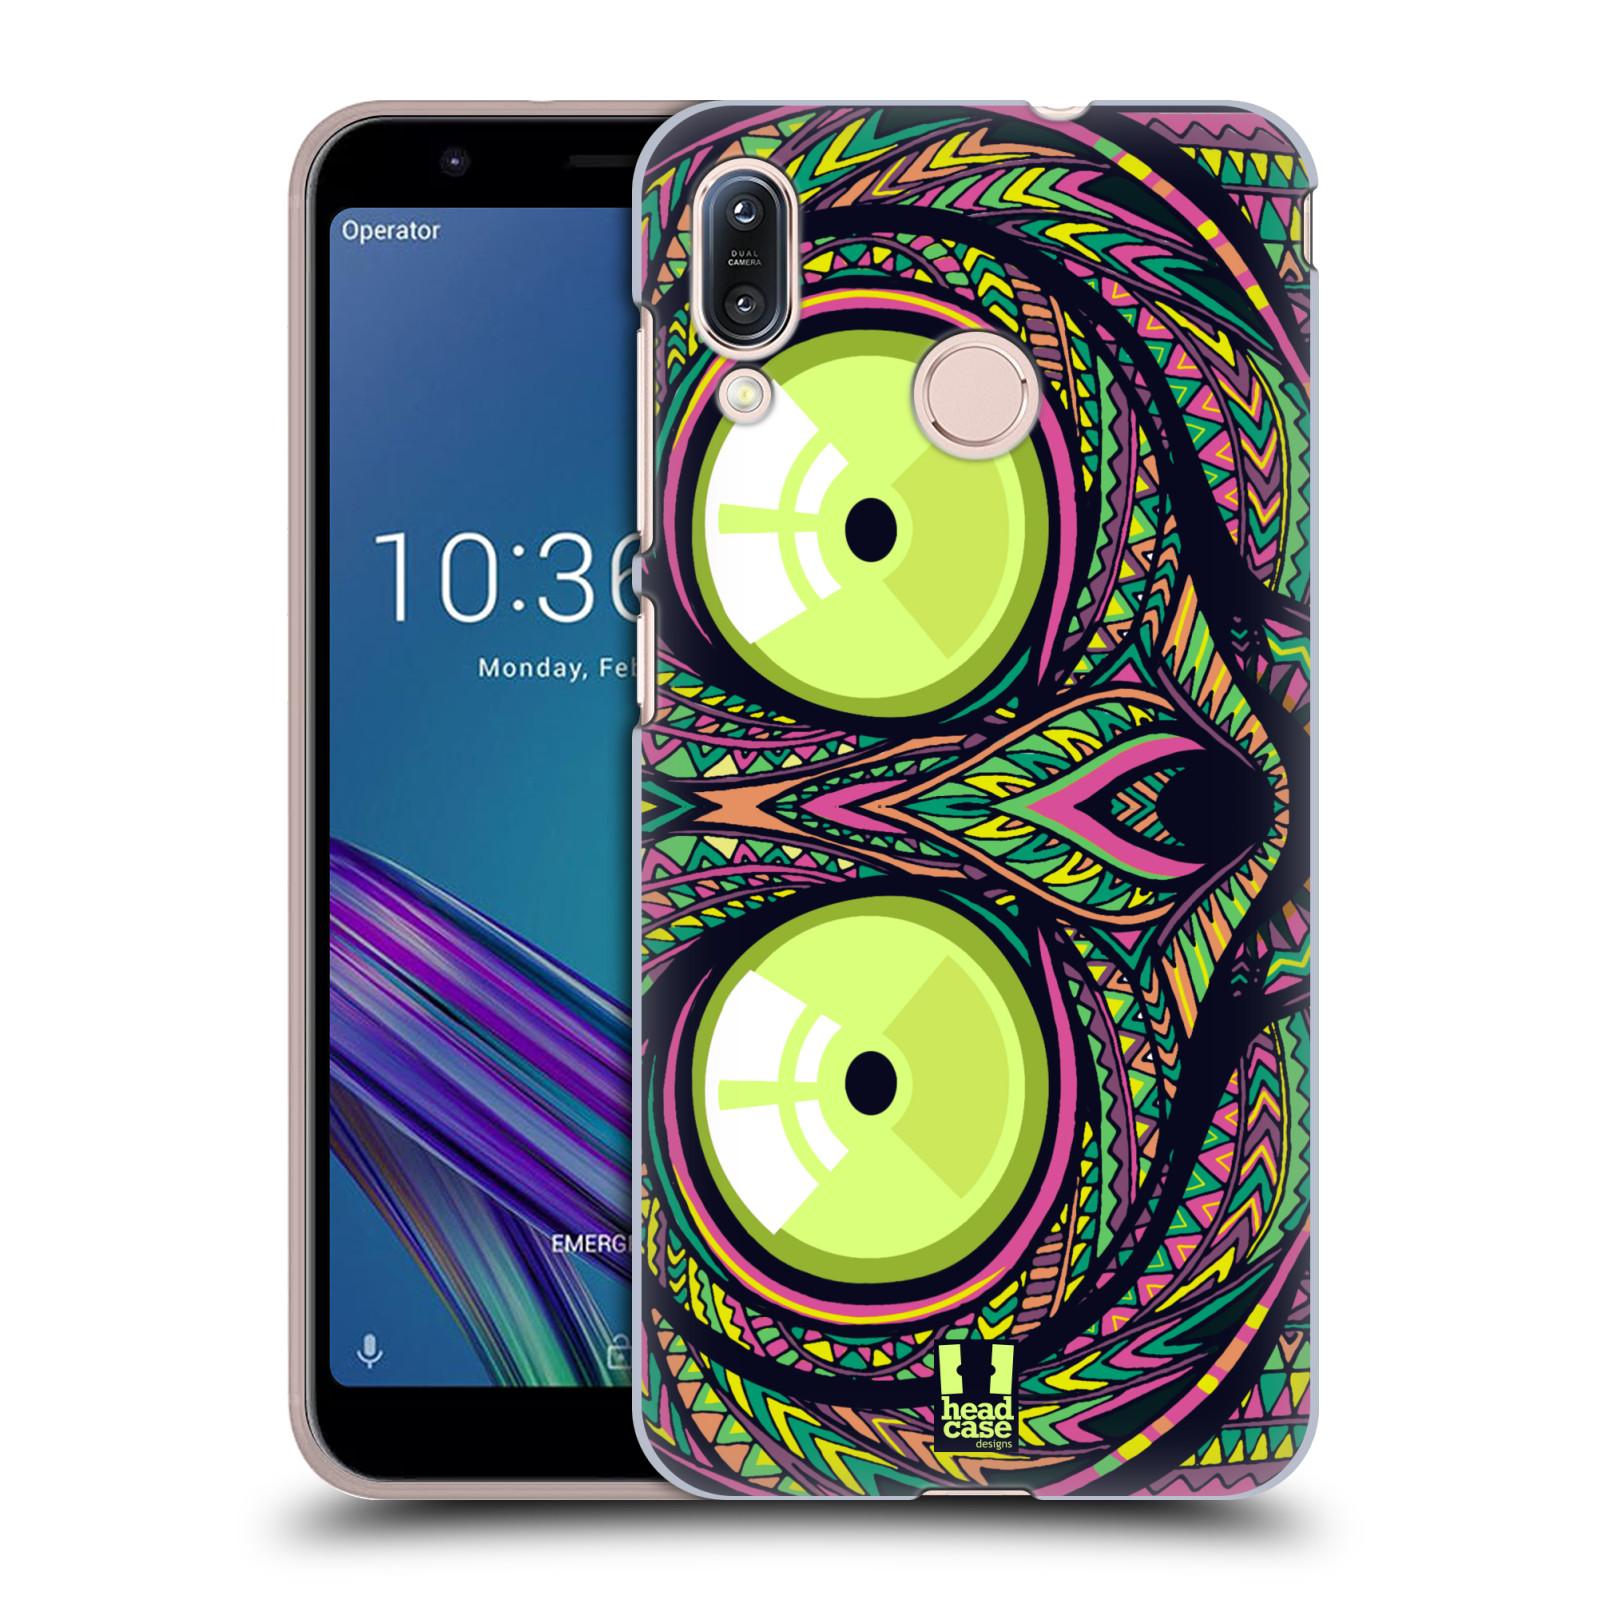 Plastové pouzdro na mobil Asus Zenfone Max M1 ZB555KL - Head Case - AZTEC NÁRTOUN